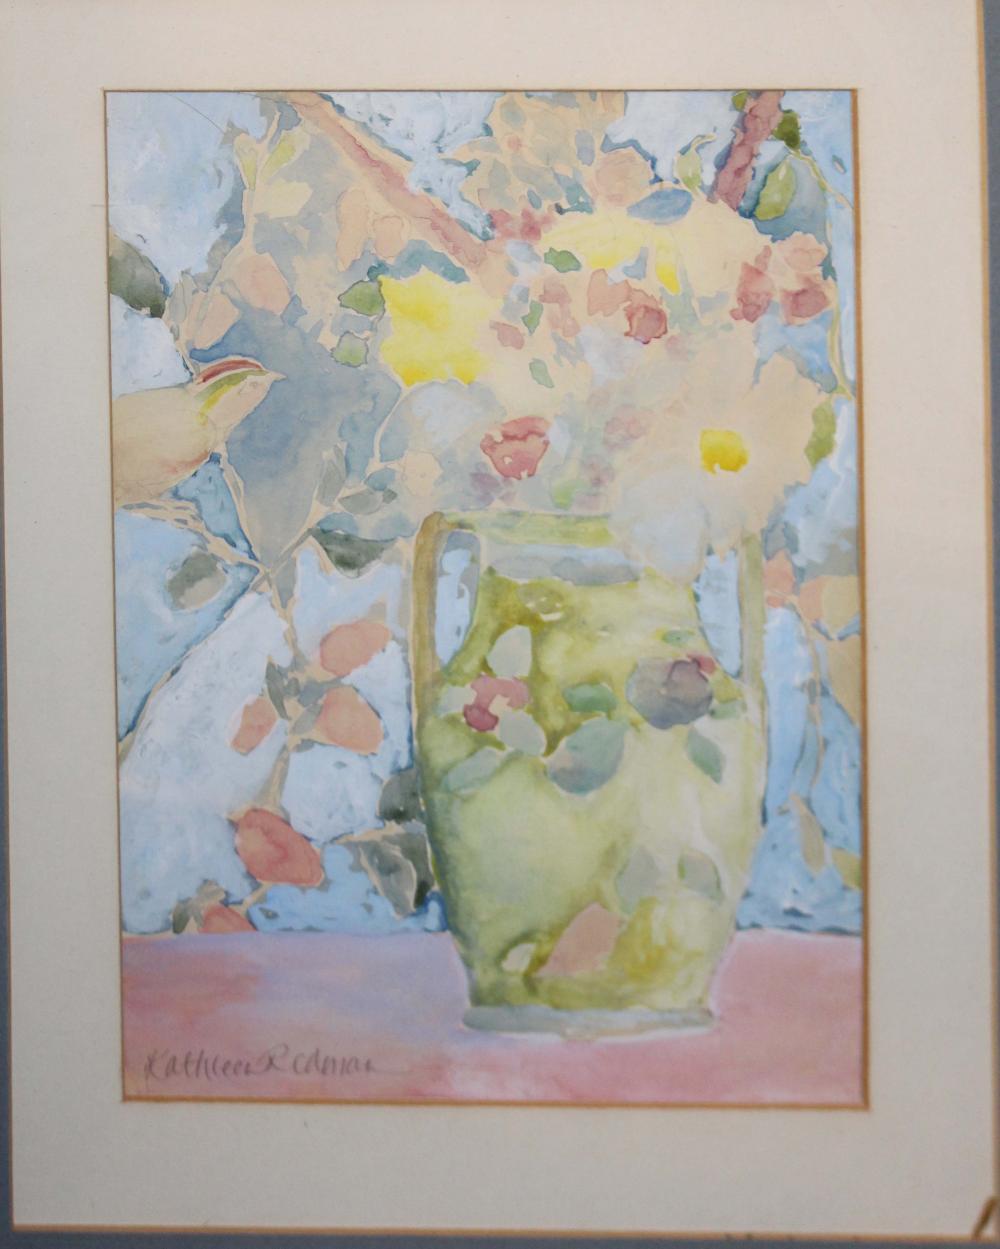 Kathleen Redman (Am 20th ) Still life with vase